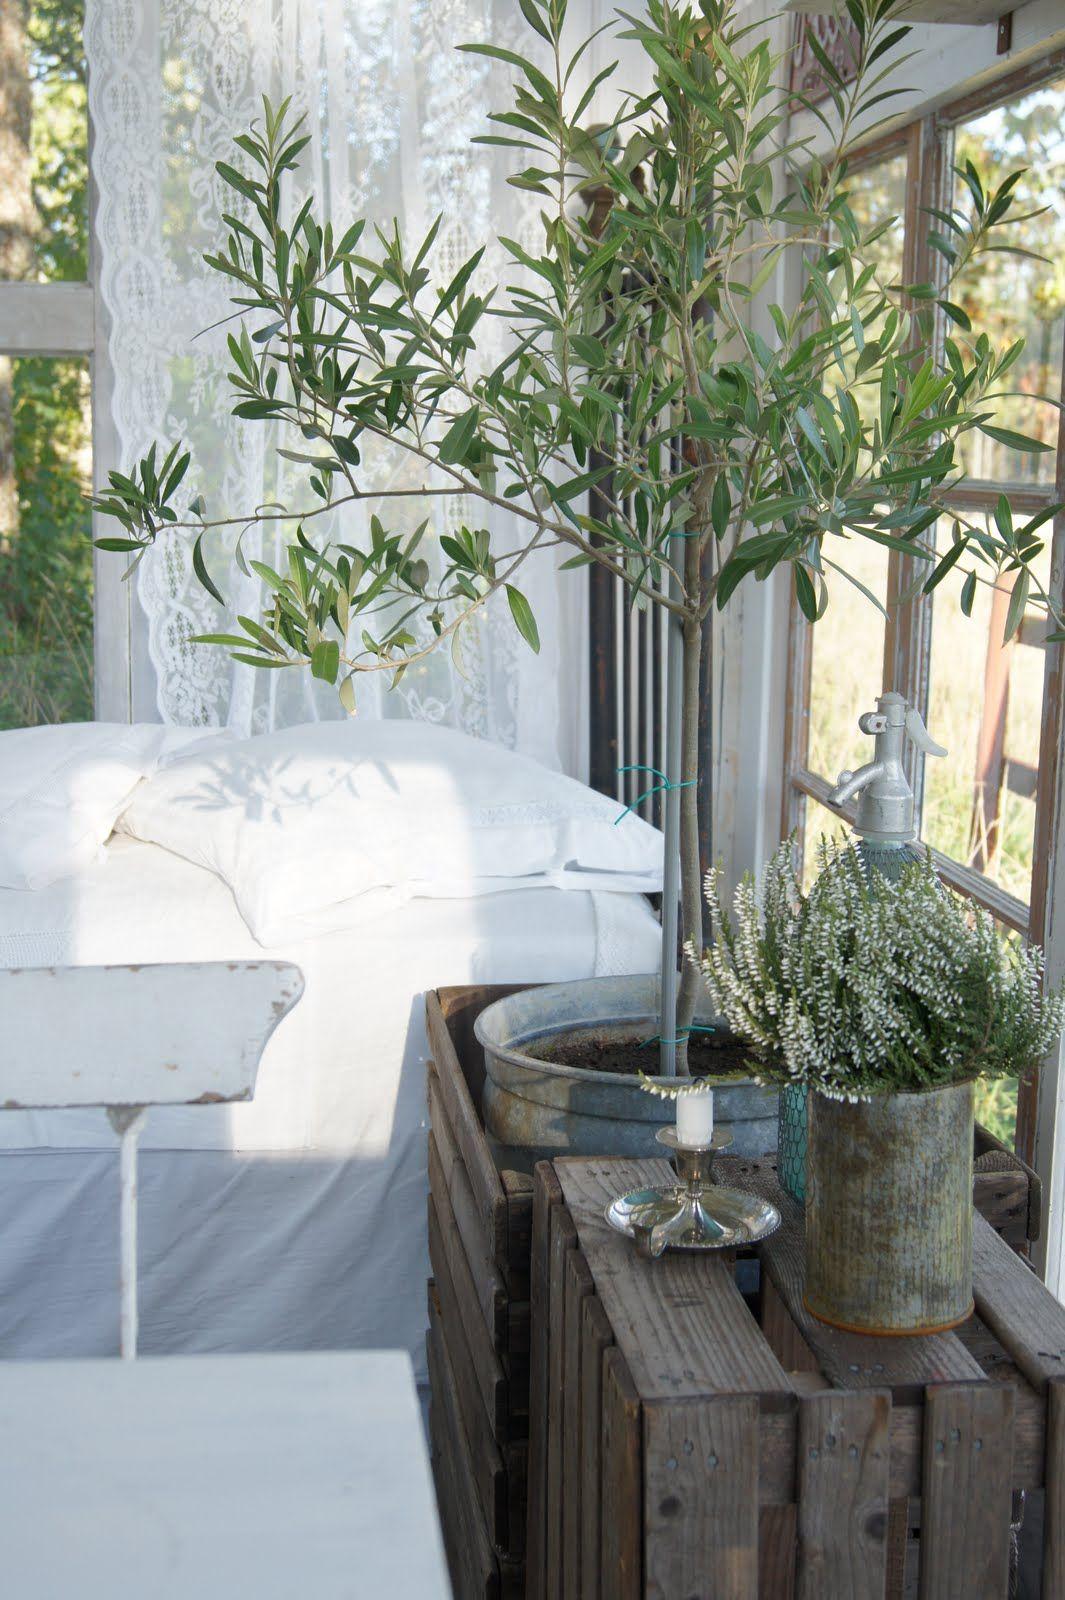 Lovrafsning Indoor Olive Tree Olive Tree Indoor Trees